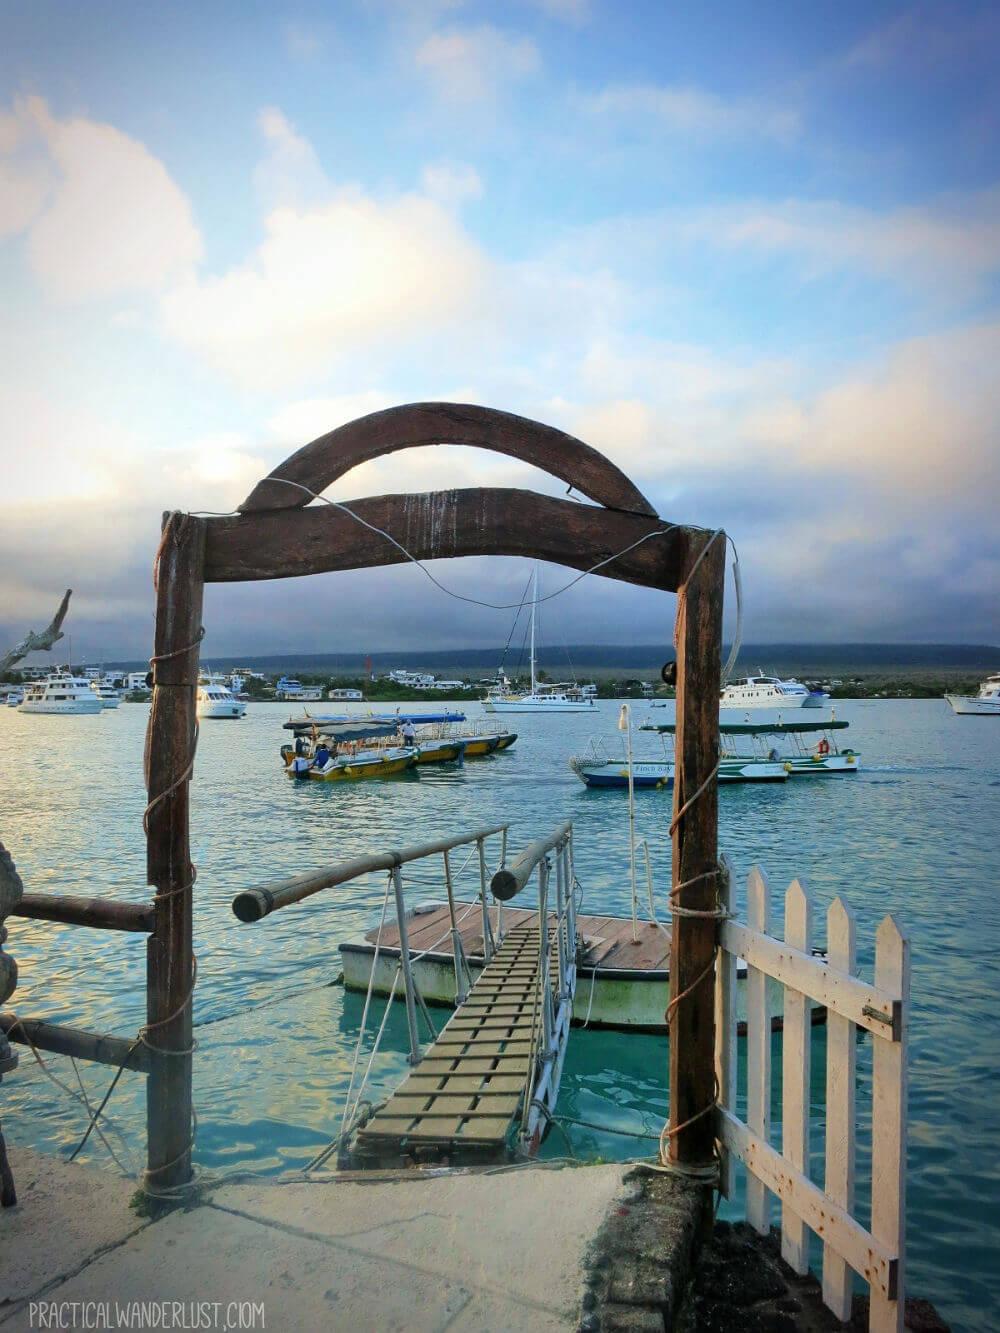 The dock leading to and from Punta Estrada and Las Grietas on Santa Cruz Island, at twilight!The dock leading to and from Punta Estrada and Las Grietas on Santa Cruz Island, at twilight!. The Galapagos Islands, Ecuador.